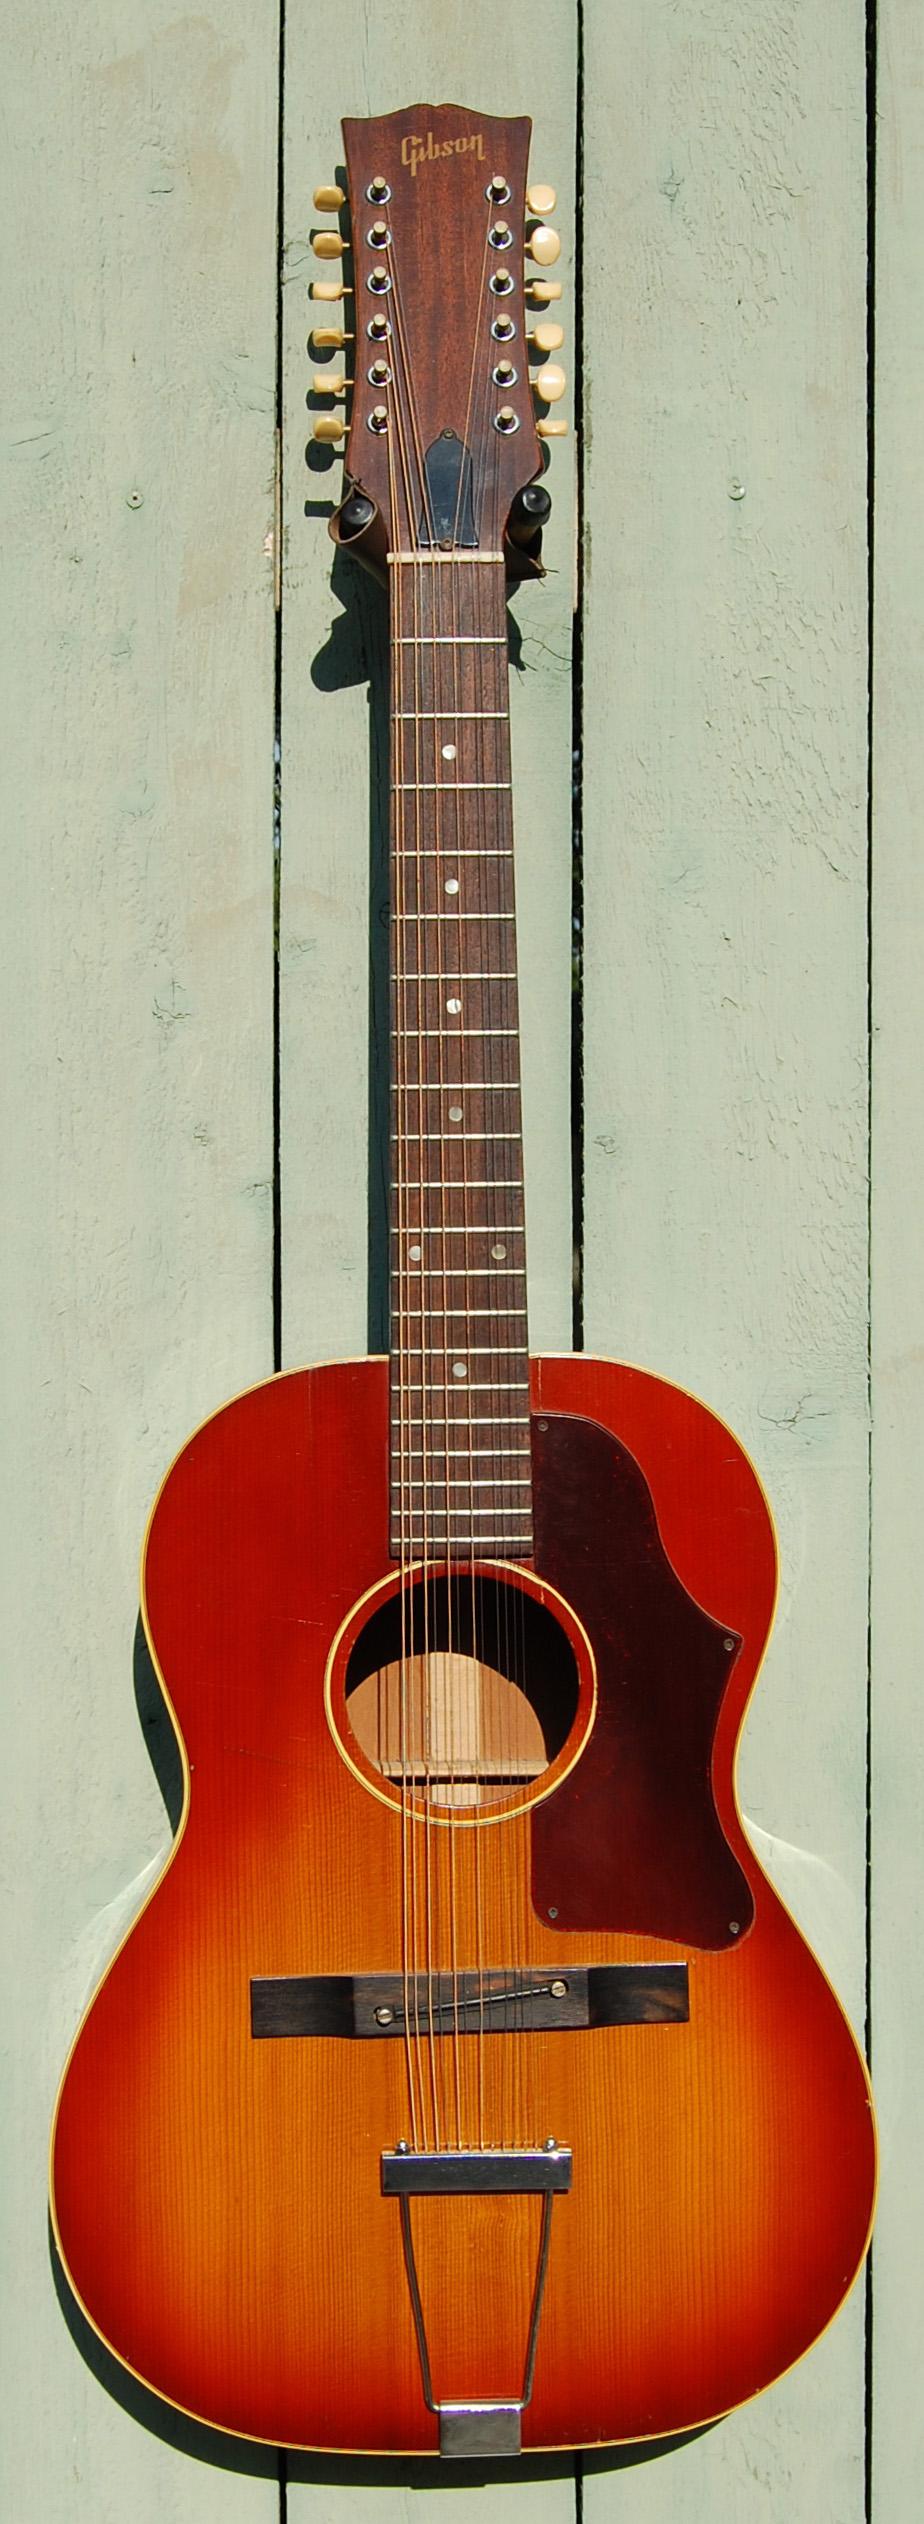 1965 Gibson B25-12